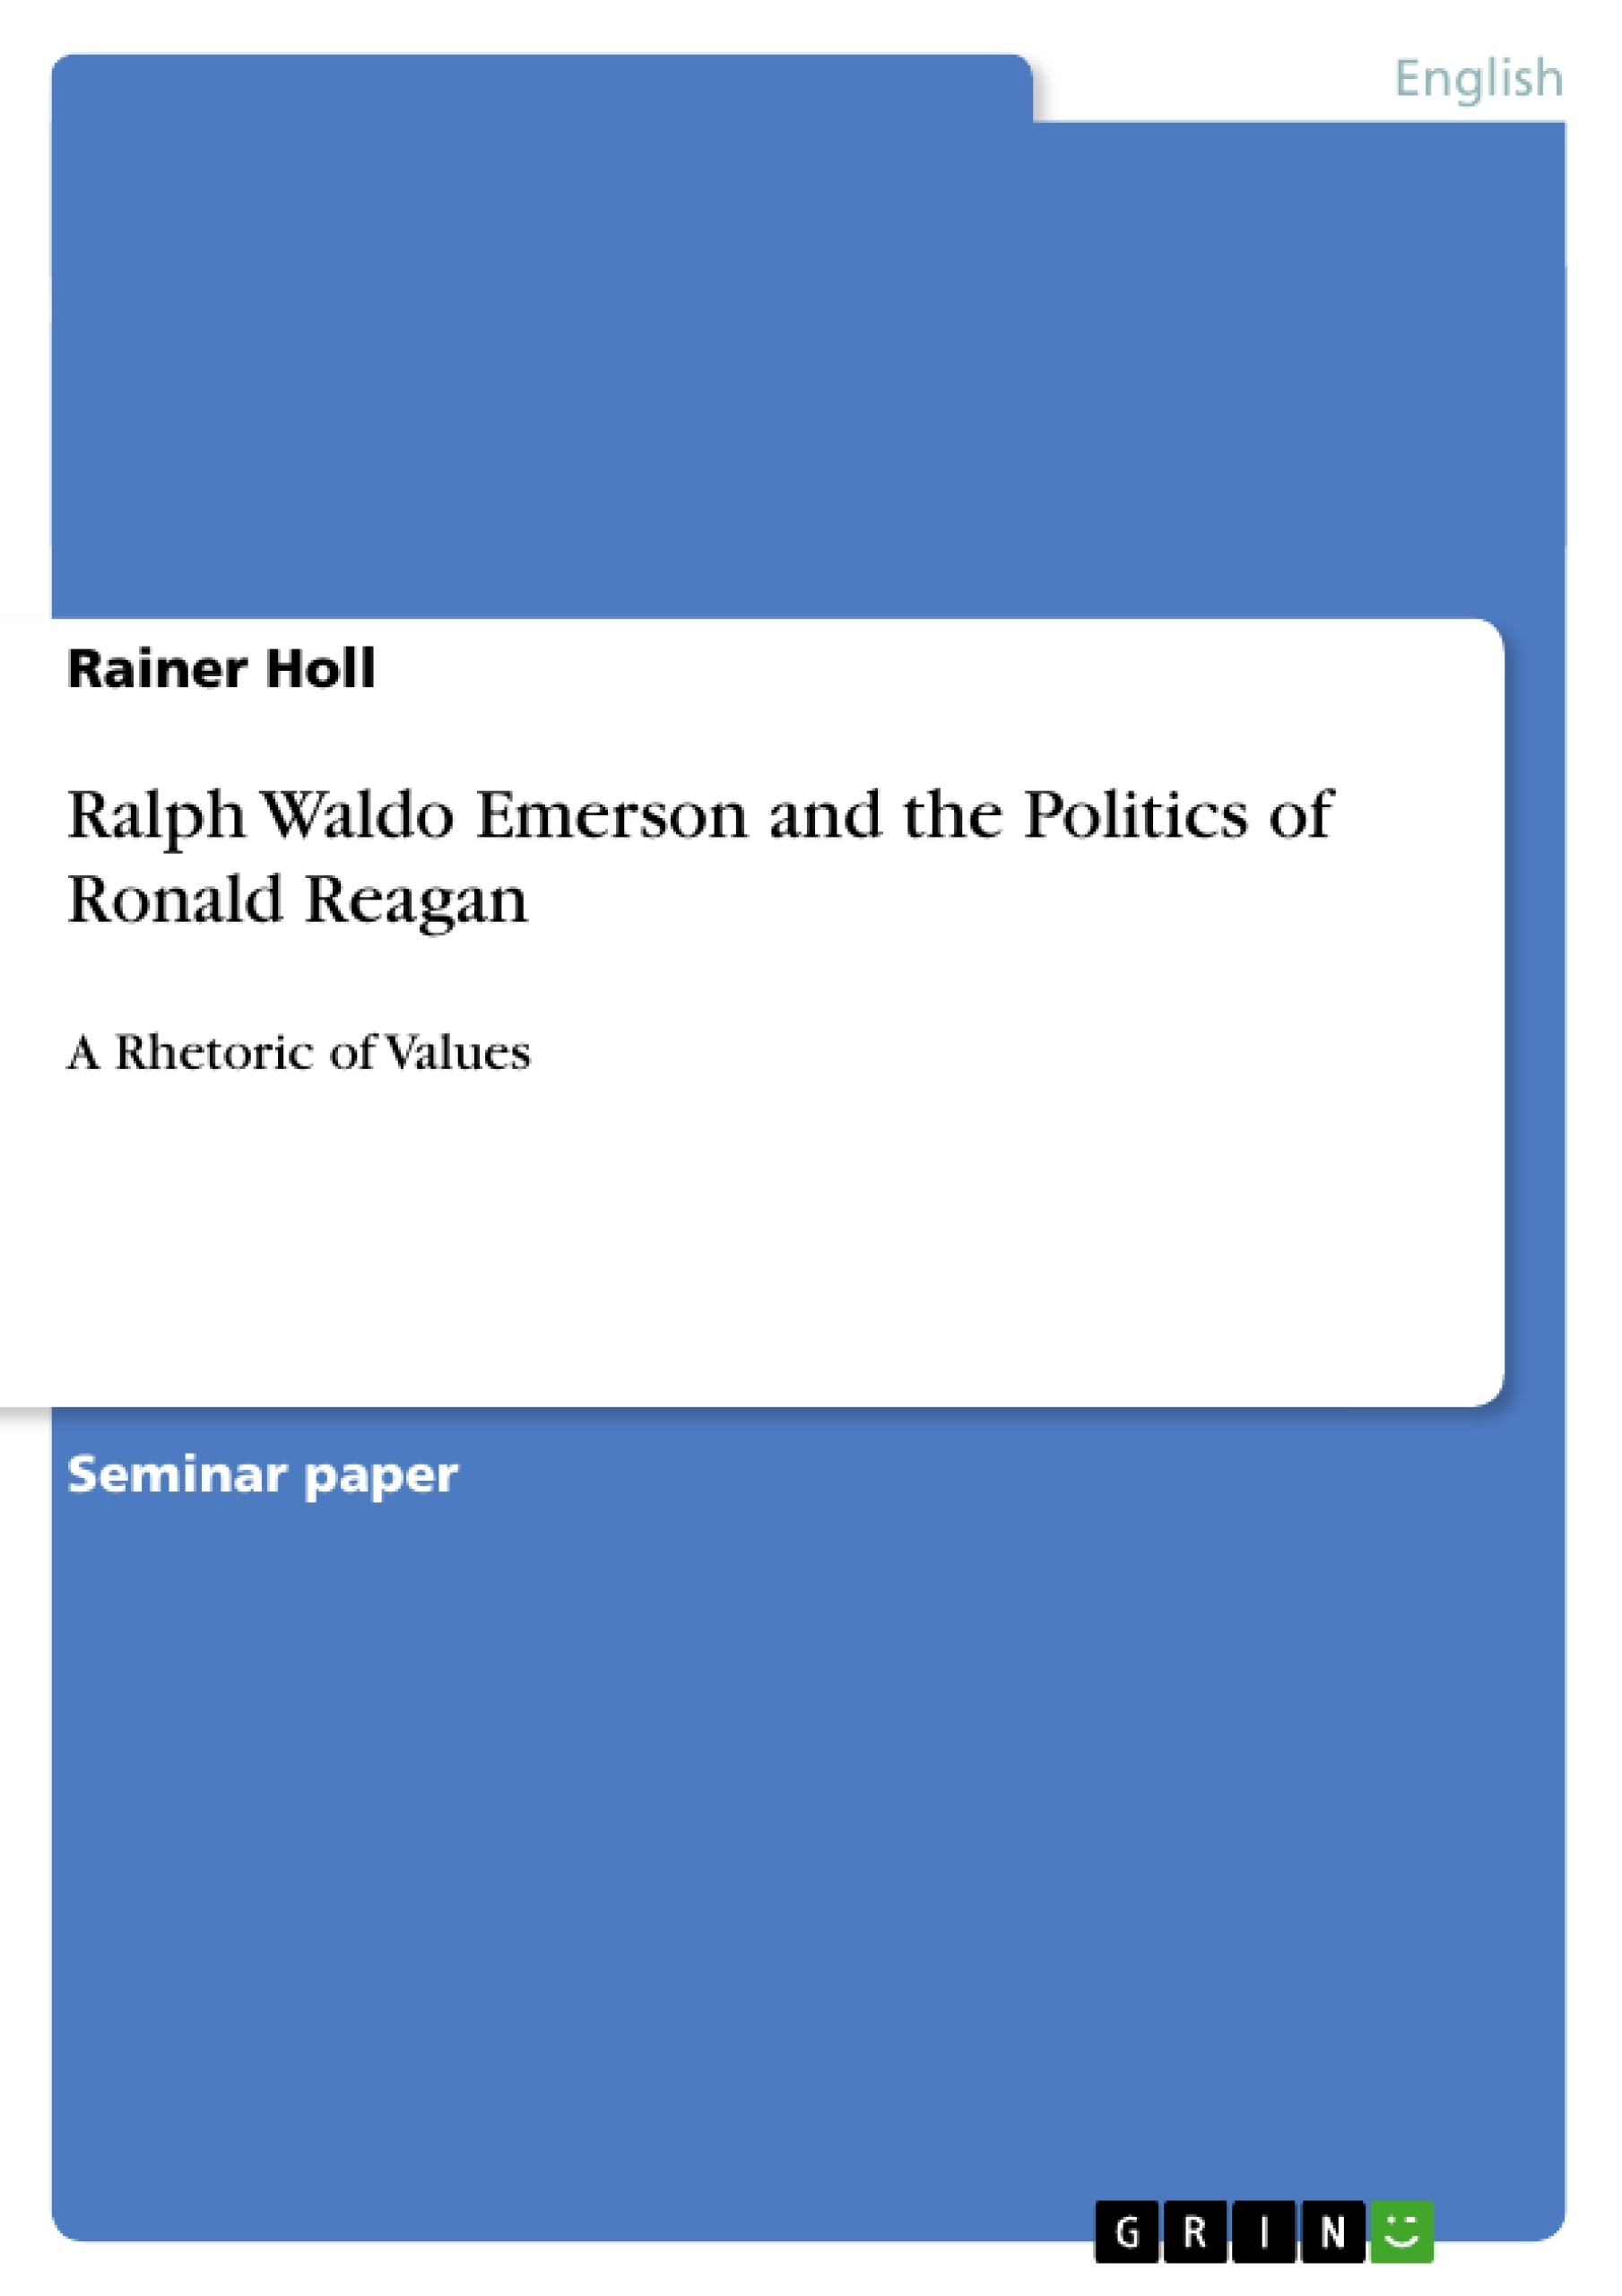 Title: Ralph Waldo Emerson and the Politics of Ronald Reagan